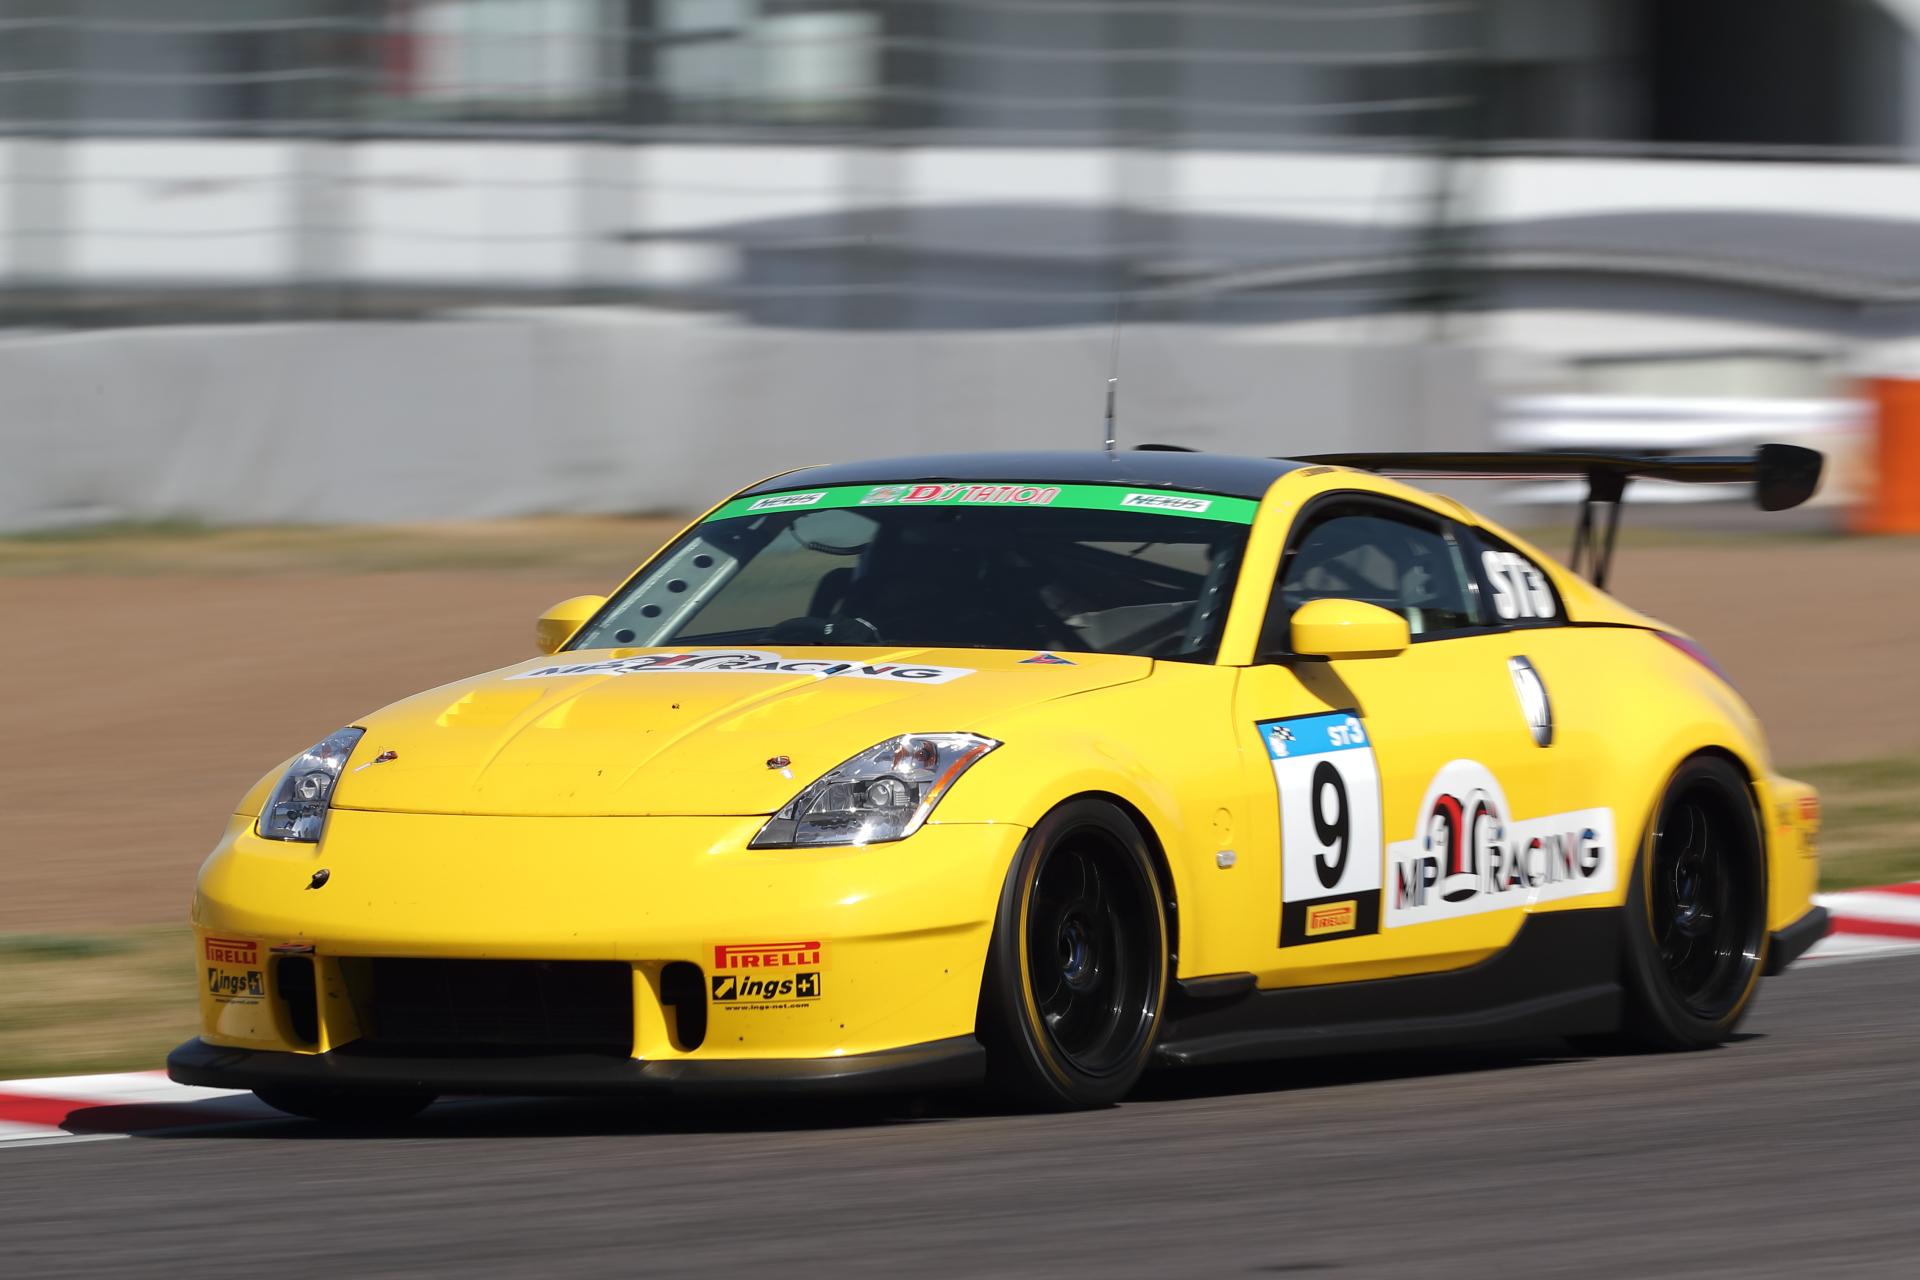 8位 No.9 MP Racing ワコーズEDニルズ(Z33)JOE SHINDO/柴田優作/井上恵一